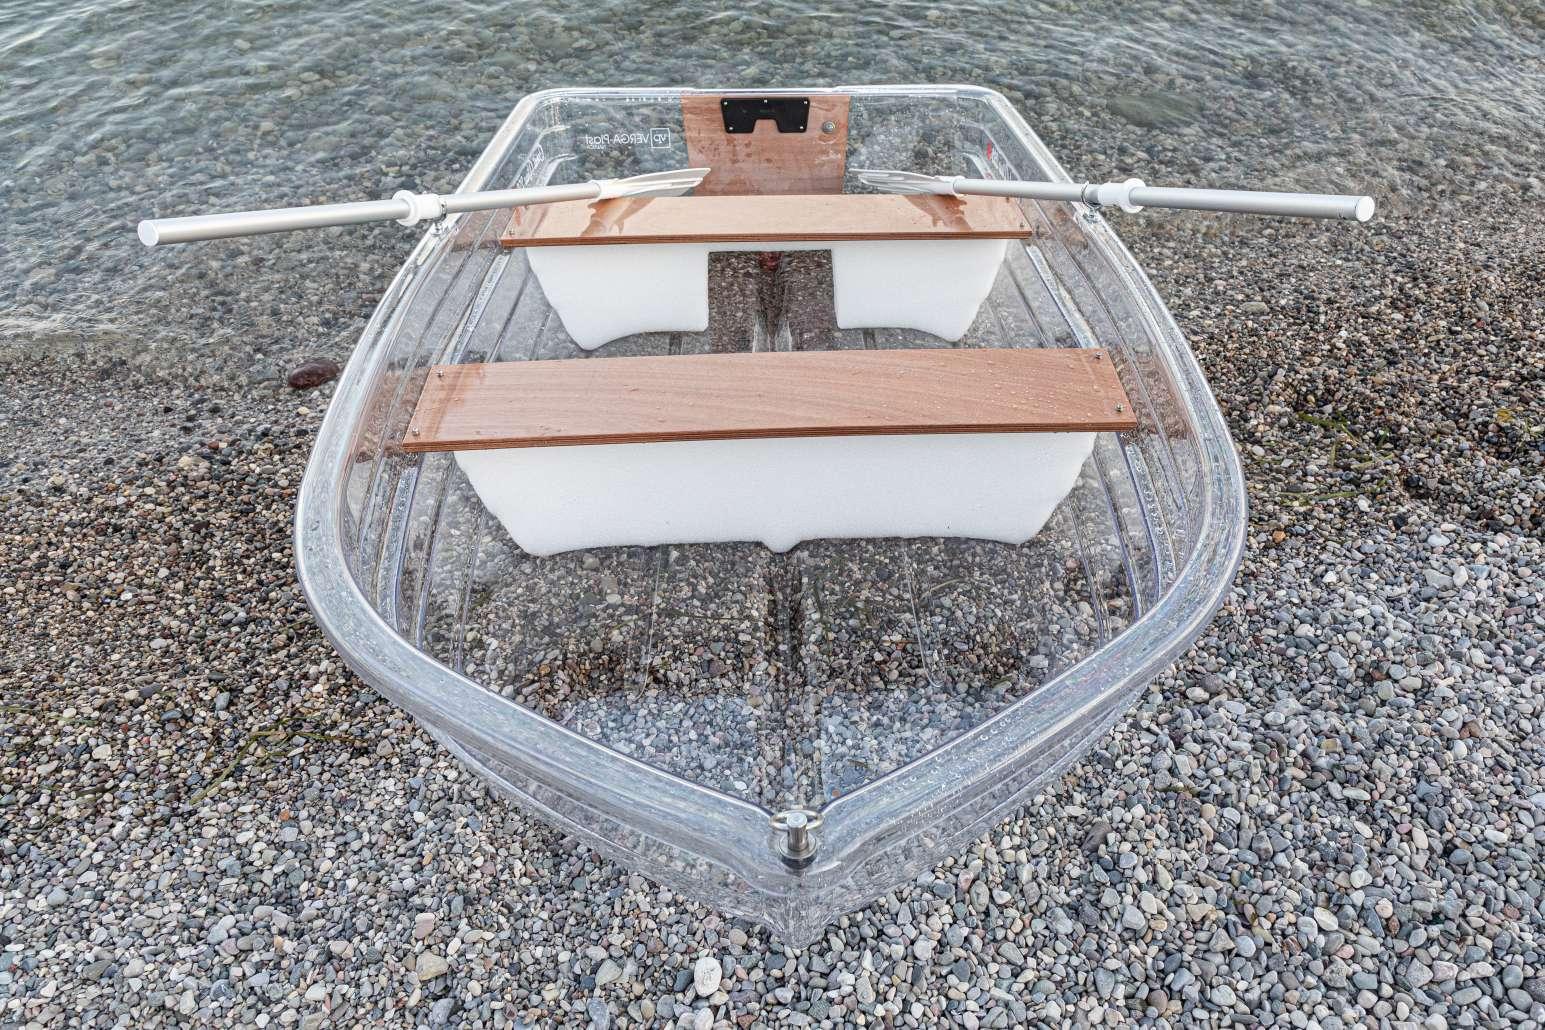 Verga-plast coralview barca trasparente 250_52